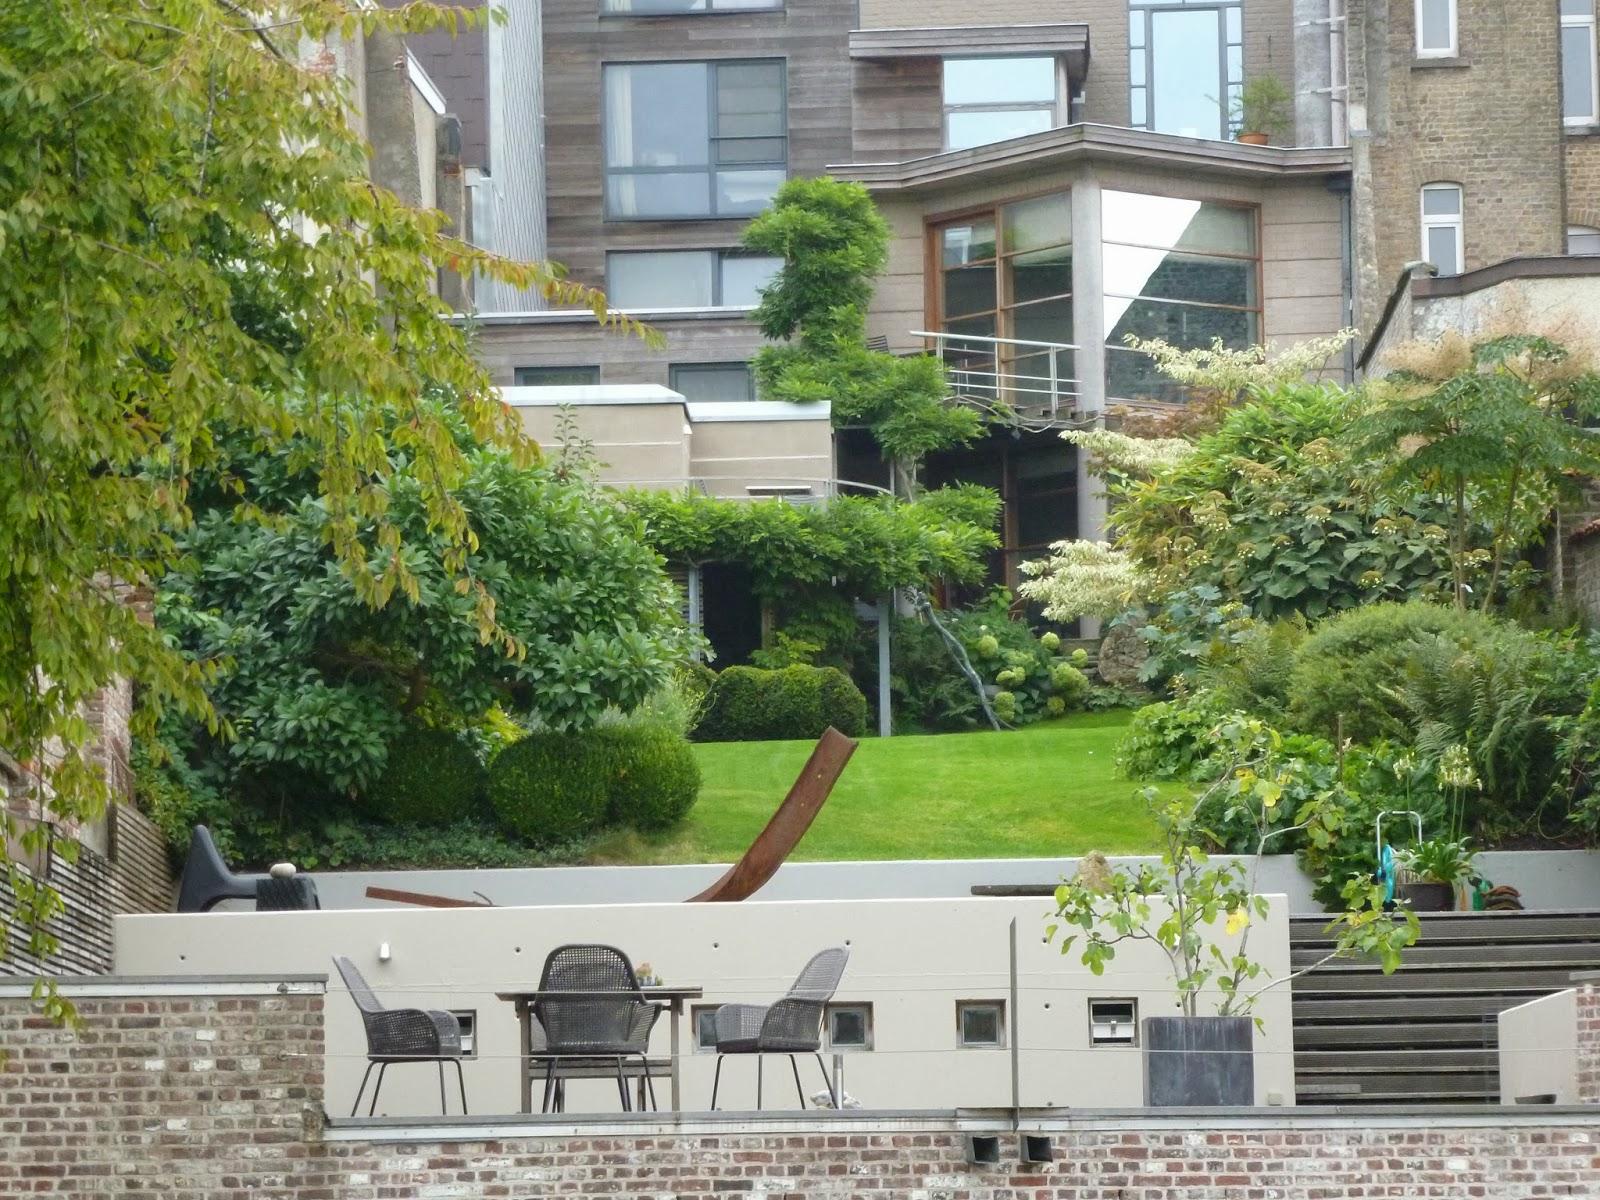 jardine et ris voyage dans l 39 air. Black Bedroom Furniture Sets. Home Design Ideas